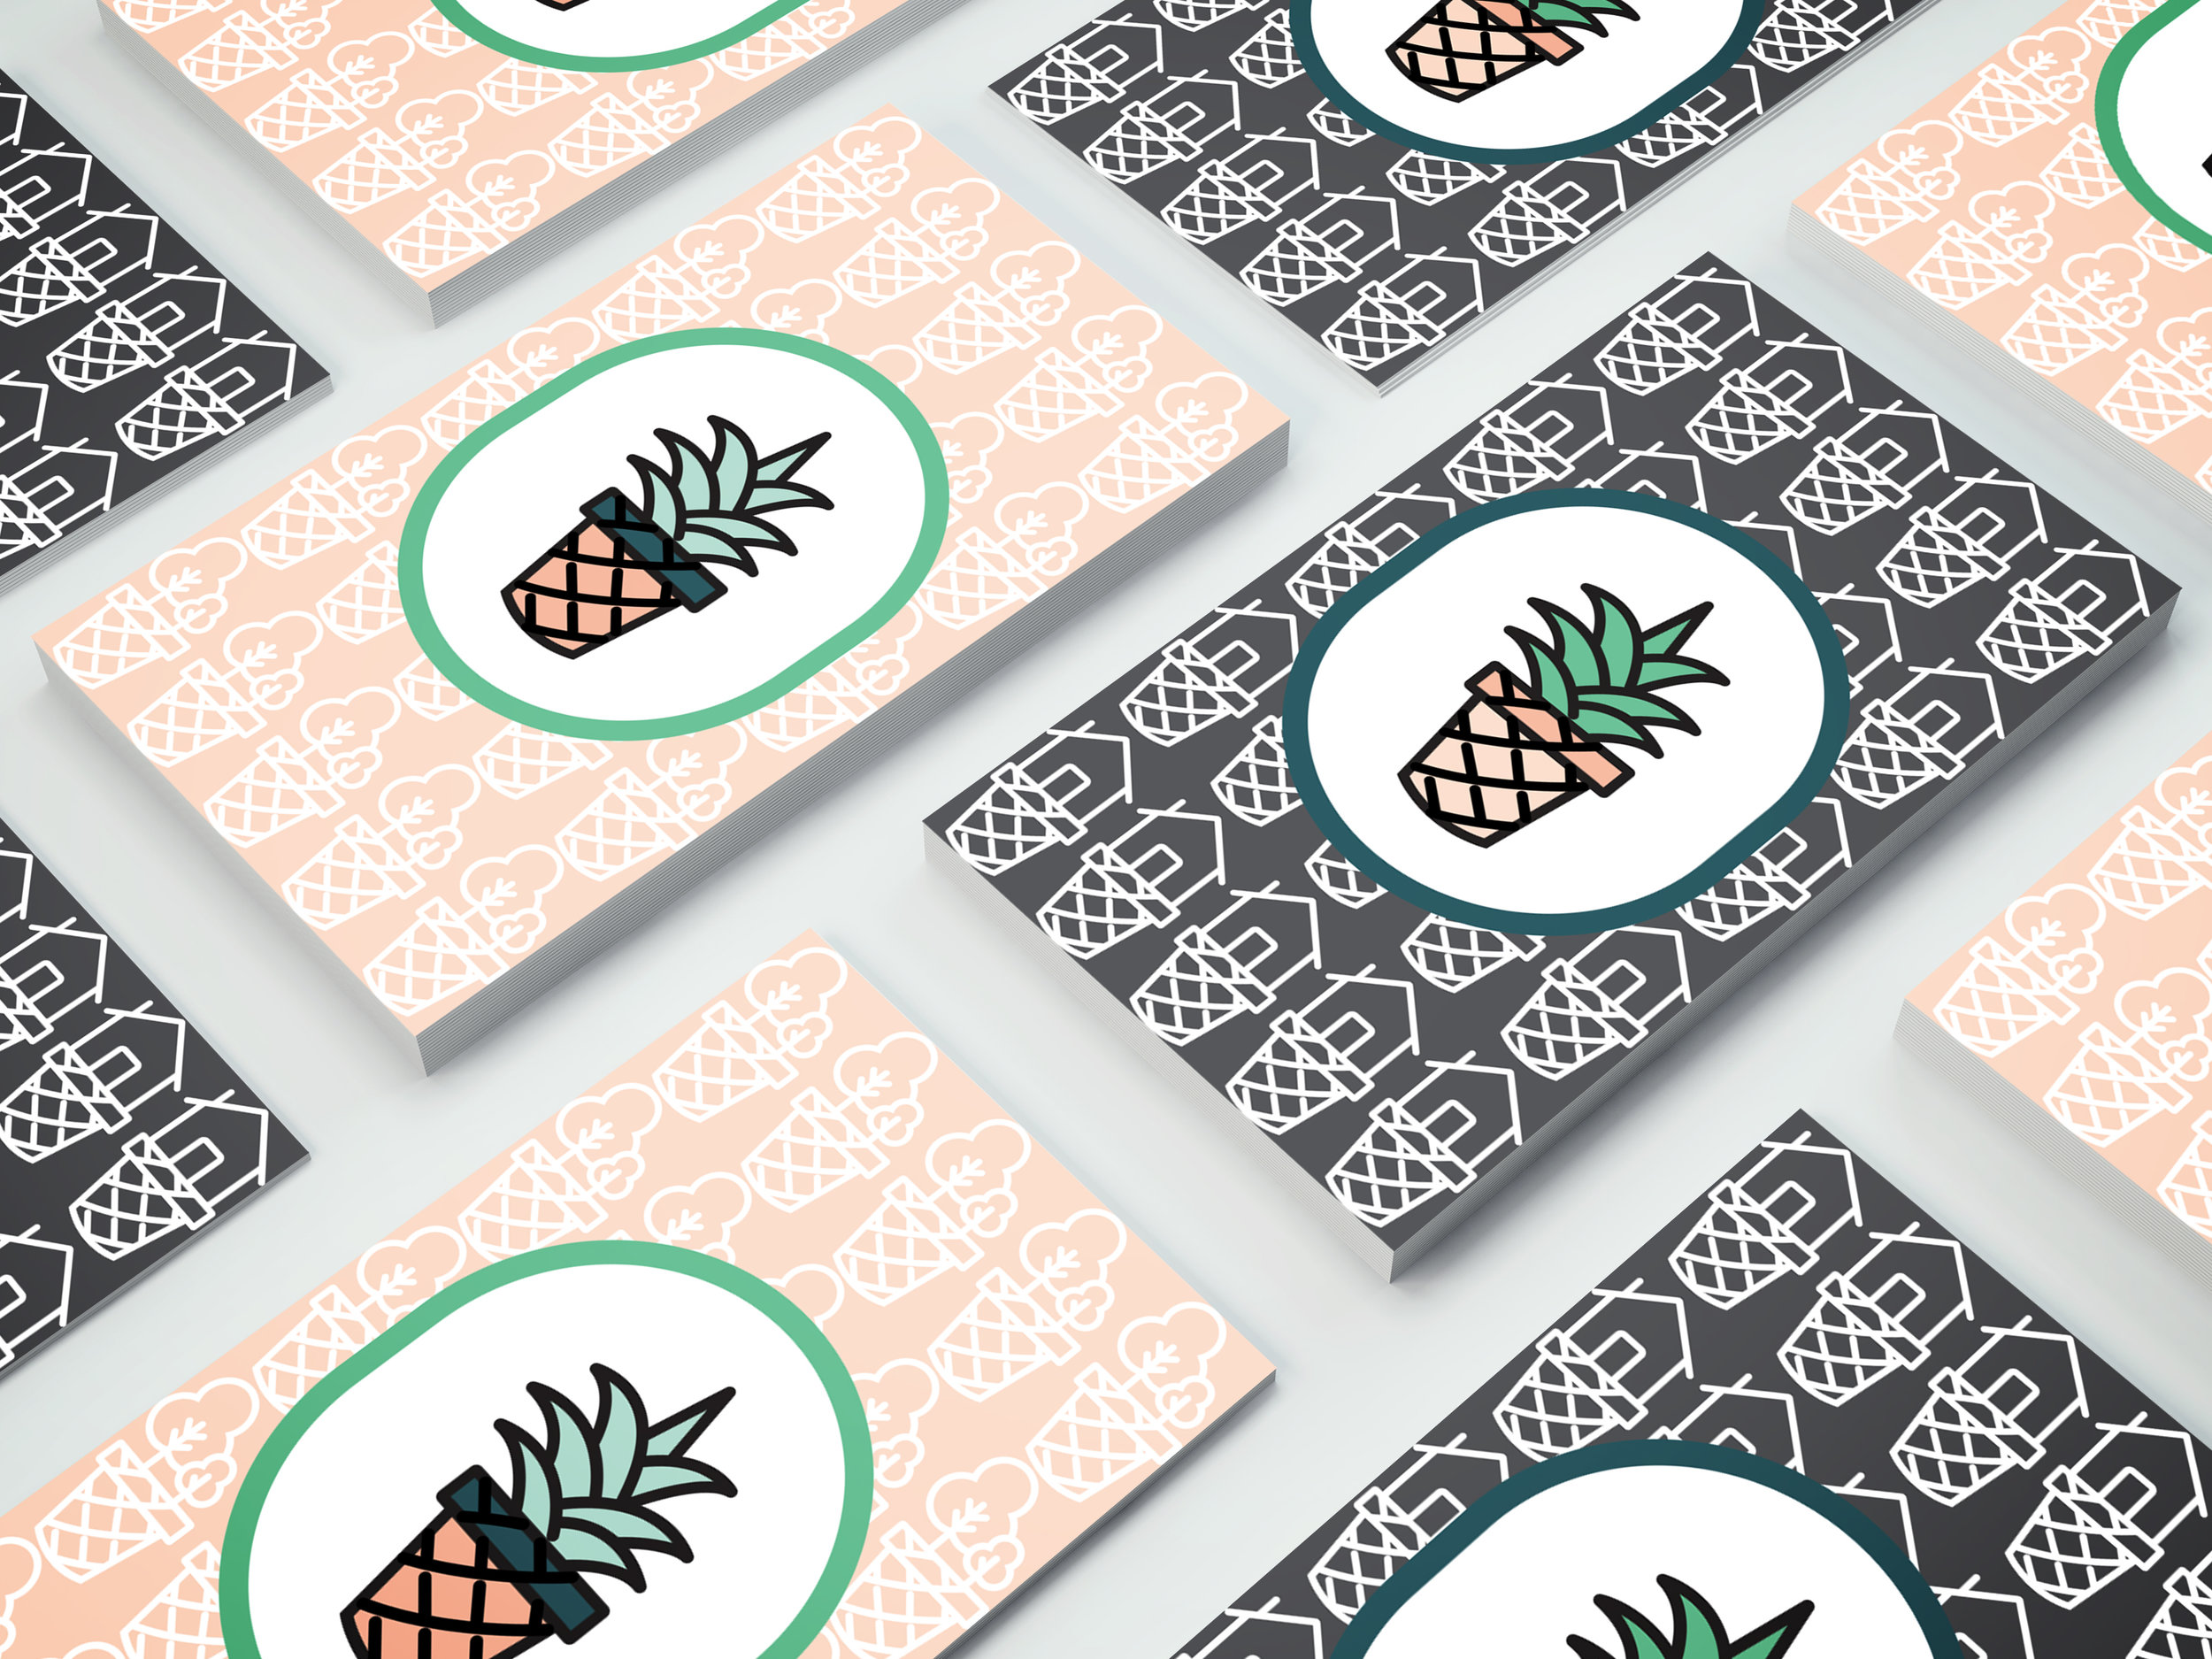 Flori Business Cards2.jpg